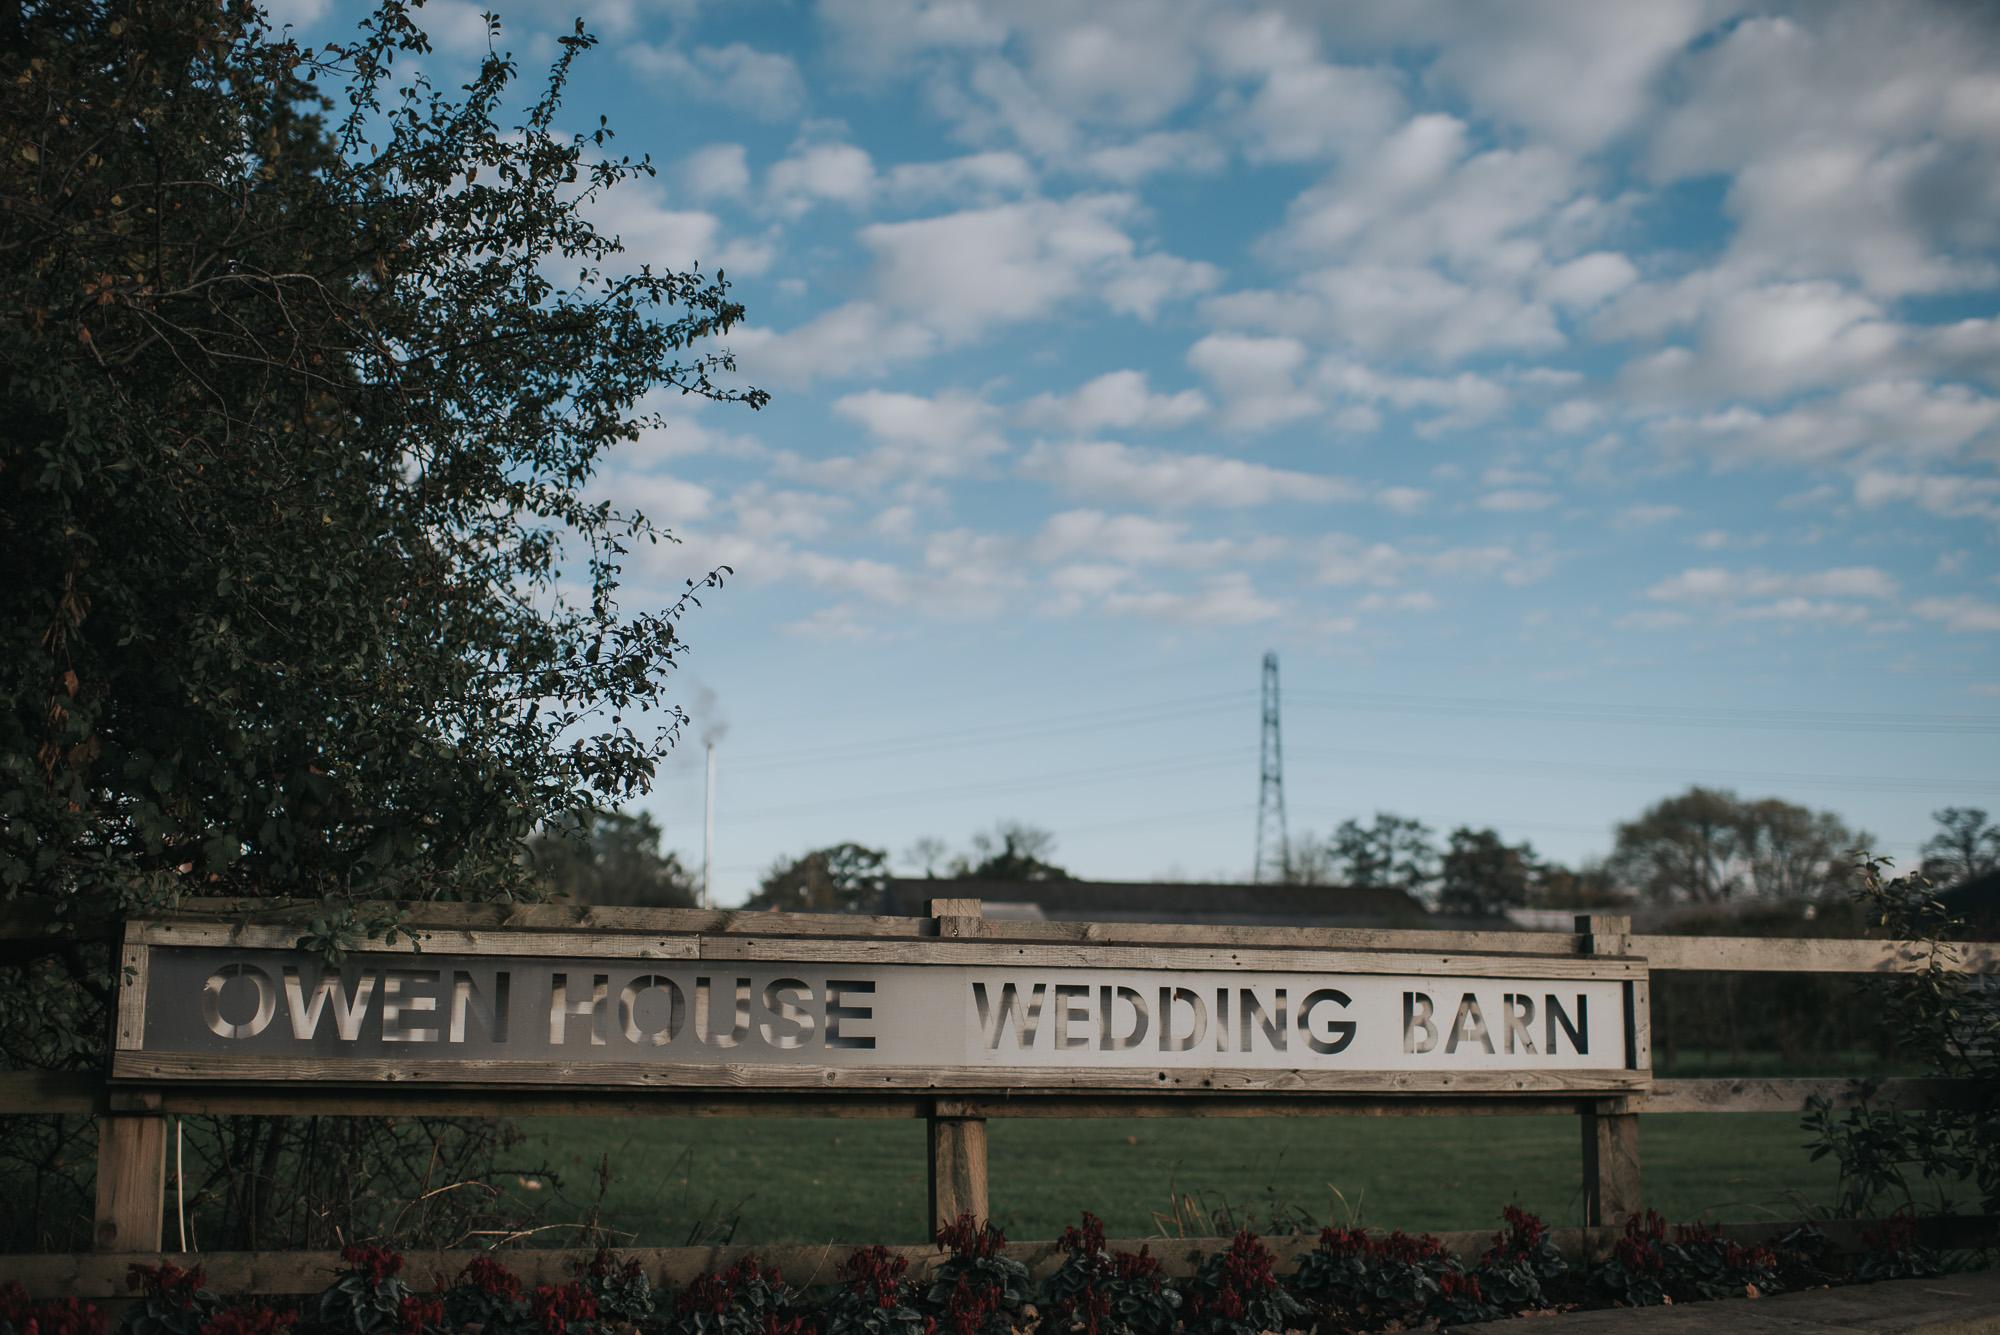 Owen HOuse Wedding Barn WEdding Photographer cheshire adam joe roberts photography (1 of 36).jpg